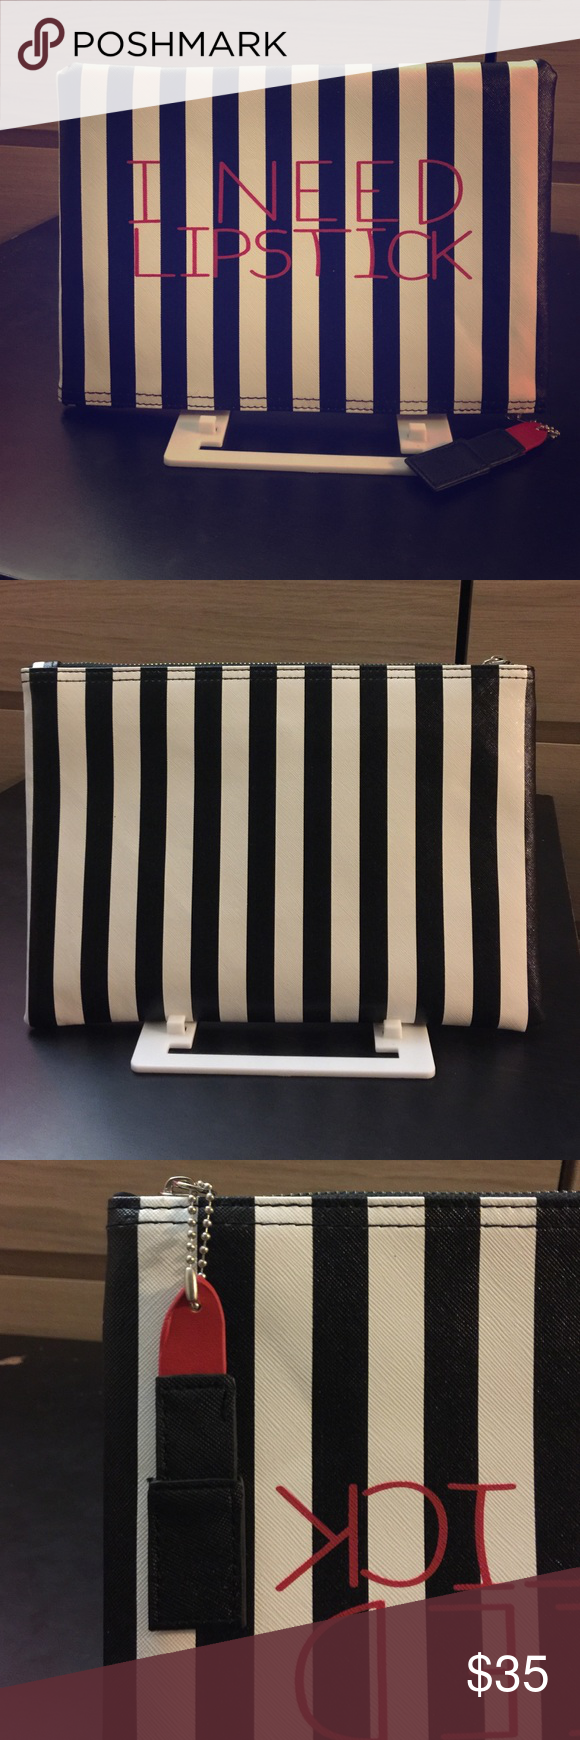 ✨NWT✨ super cute bag Super cute bag Bags Clutches & Wristlets